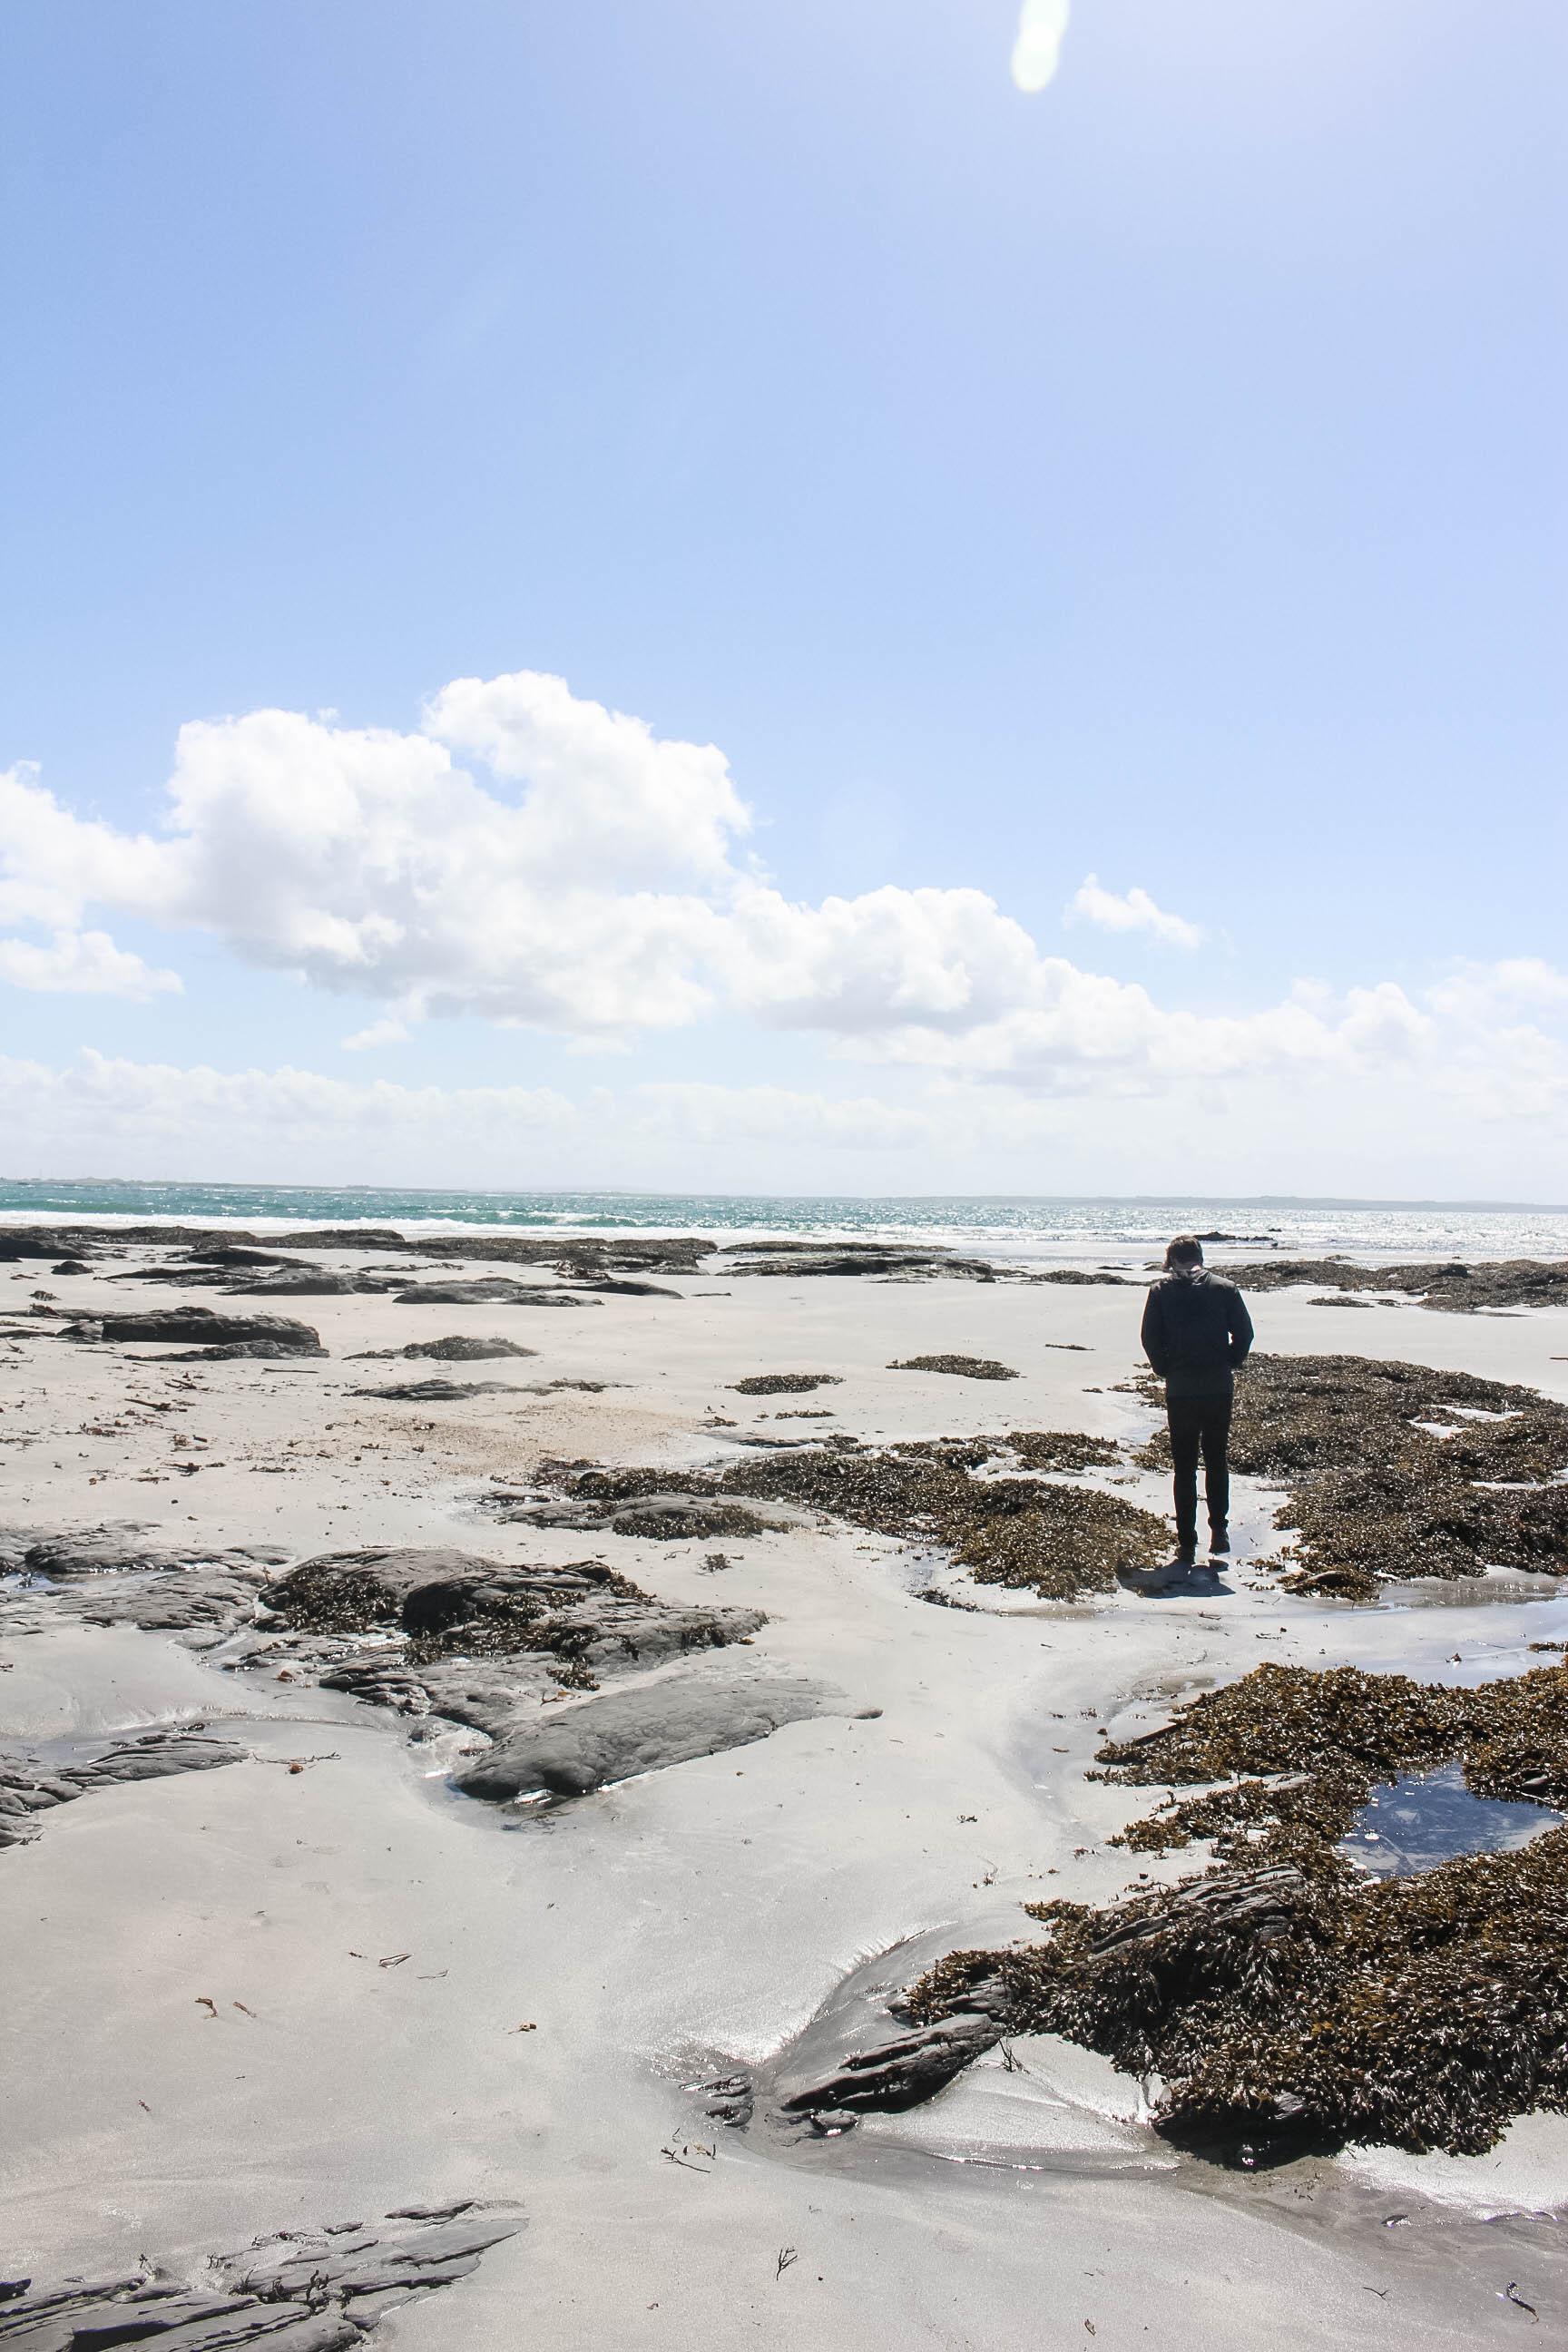 Hidden Beaches of County Clare Ireland near the Cliffs of Moher